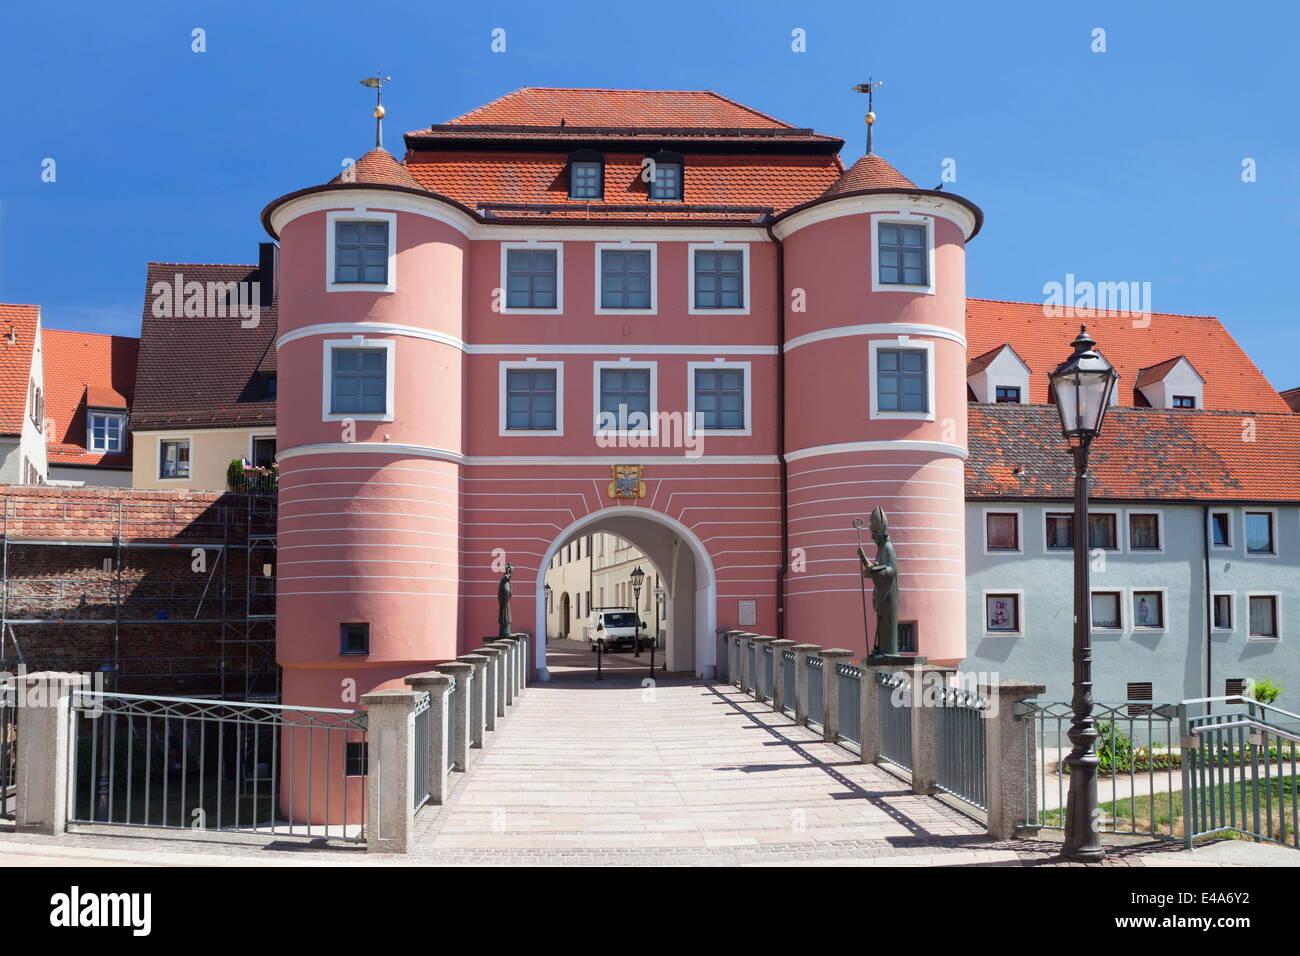 Rieder Tor gate, Donauworth, Romantic Road, Bavarian Swabia, Bavaria, Germany, Europe - Stock Image